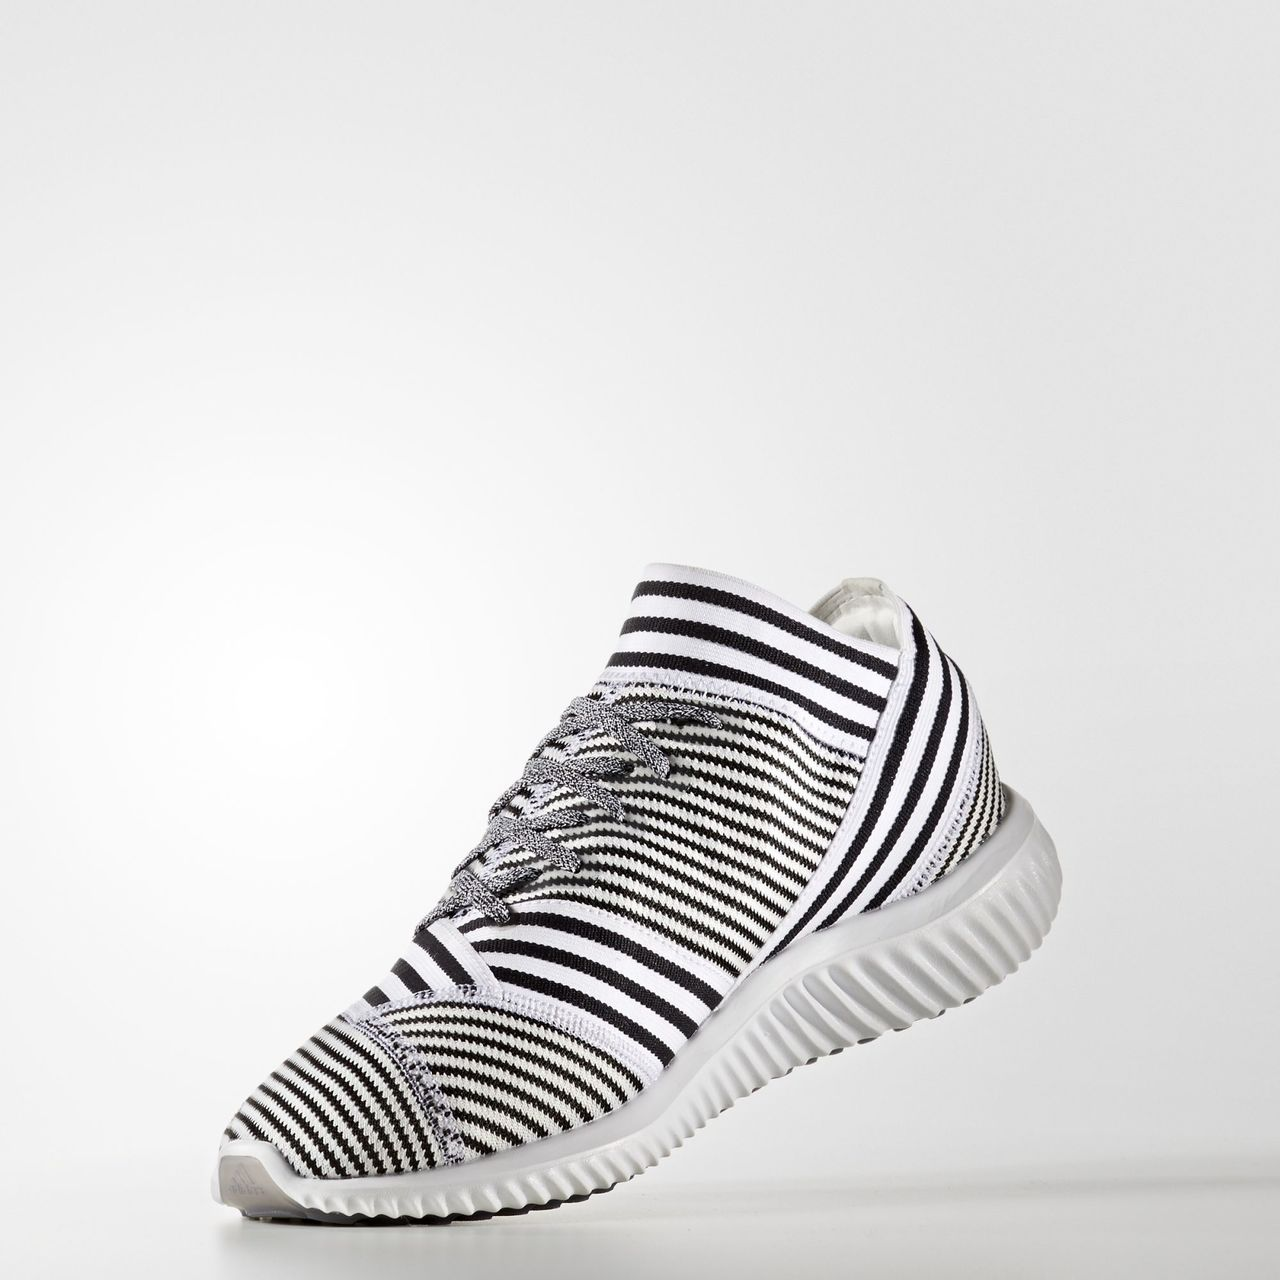 aerolíneas camino exégesis  Adidas Nemeziz Tango 17.1 Trainers - Footwear White / Core Black |  Equipment | Football shirt blog